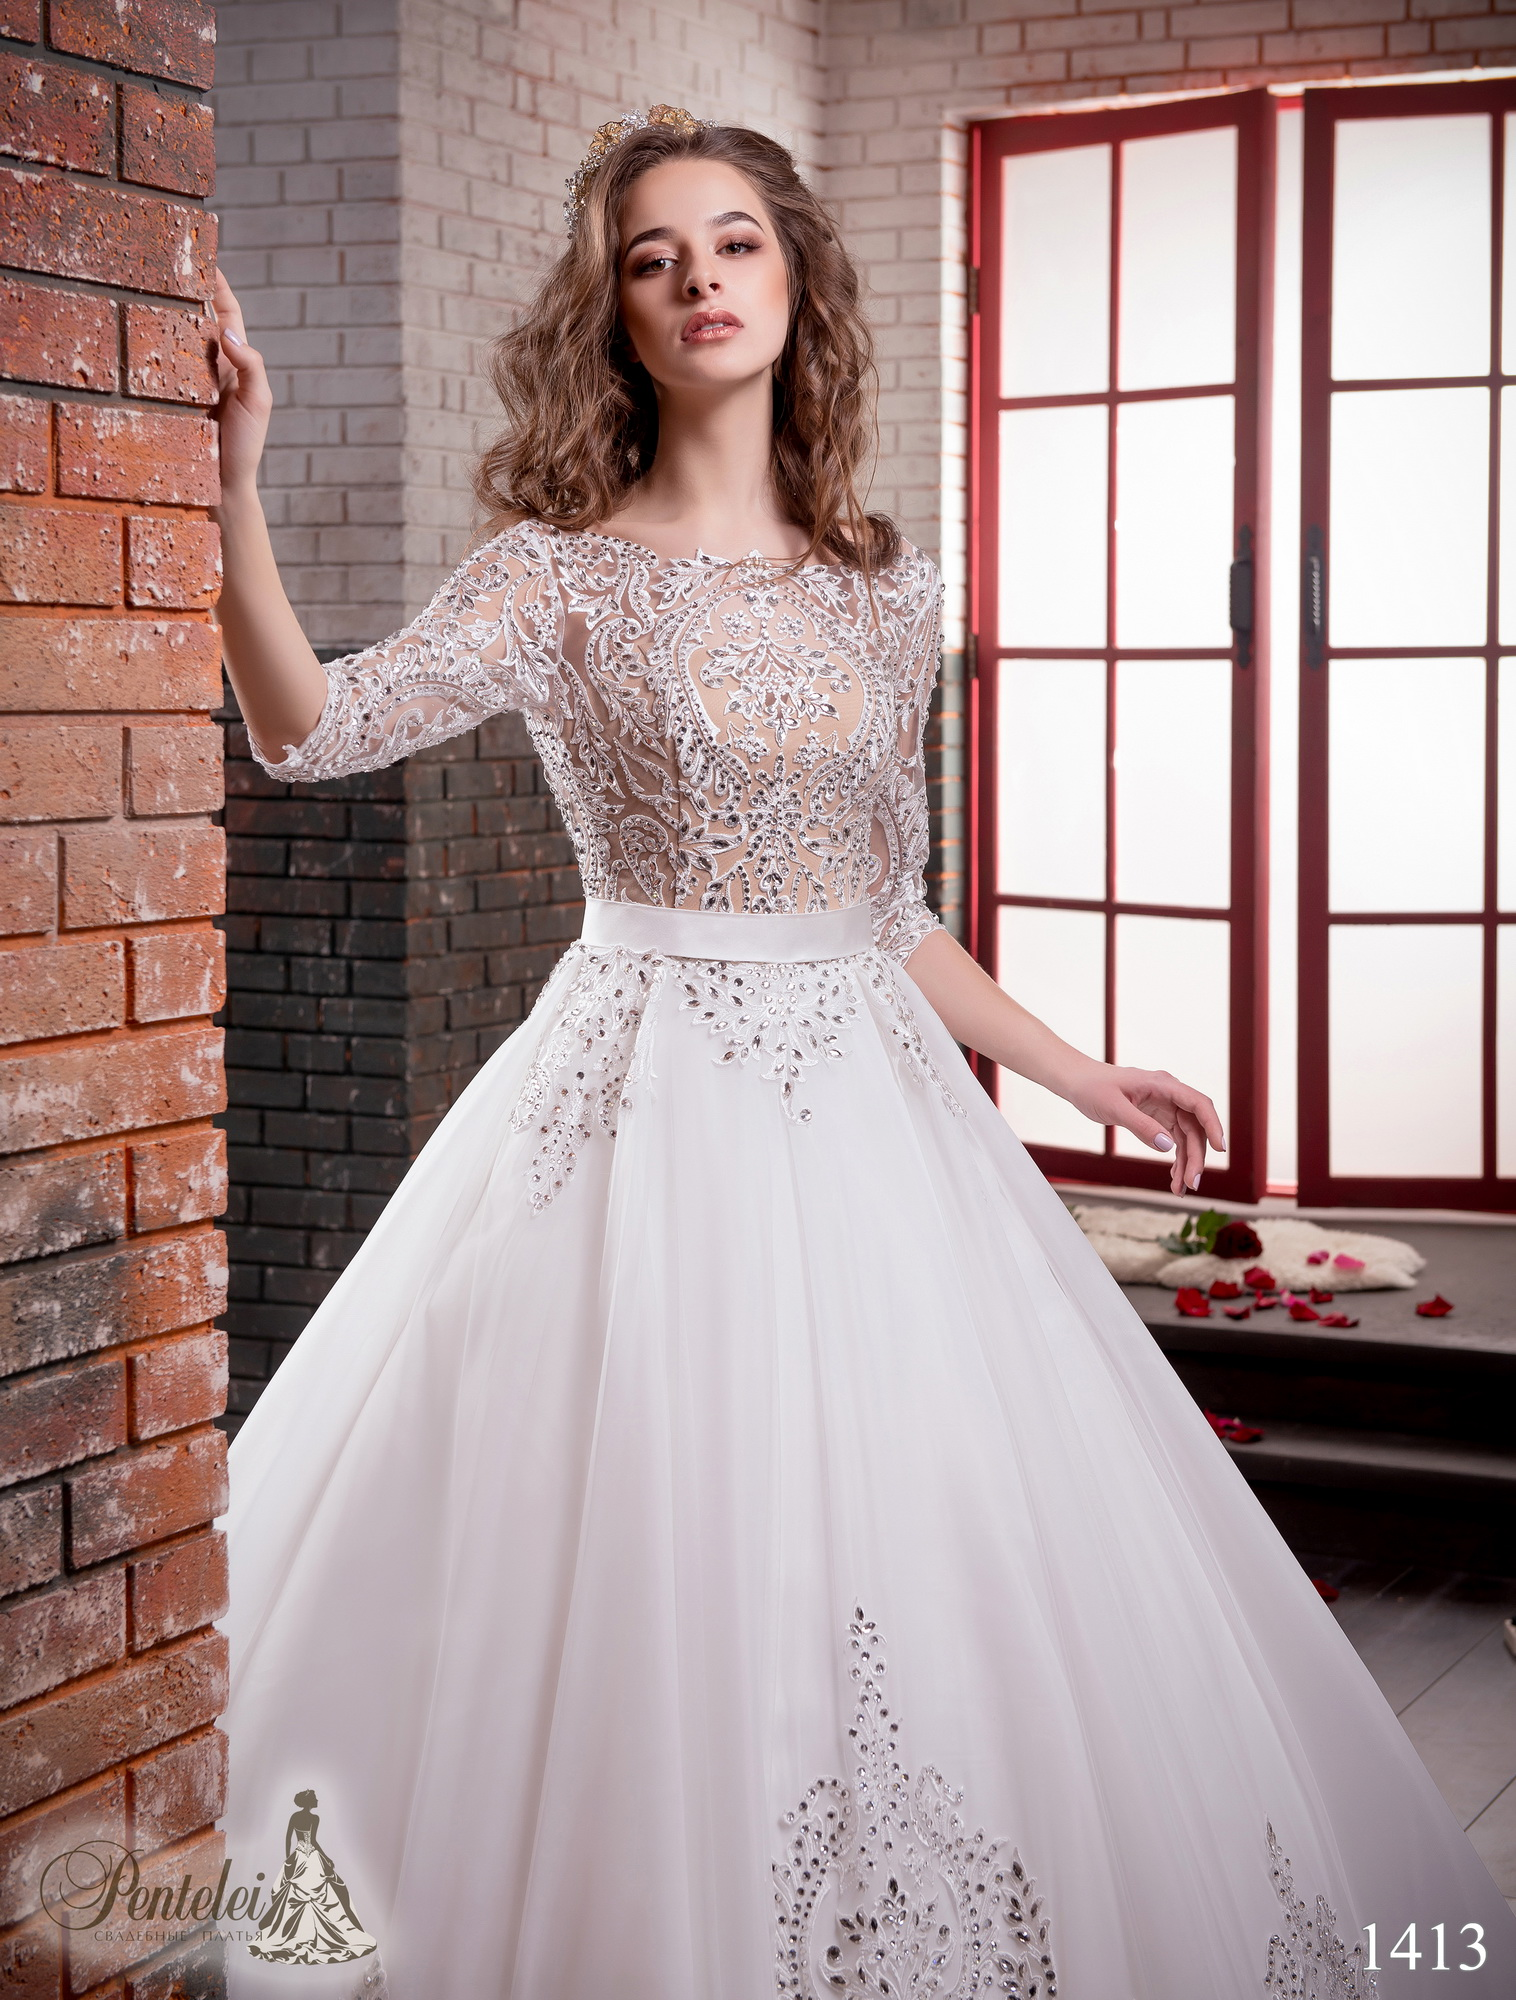 1413 | Buy wedding dresses wholesale from Pentelei